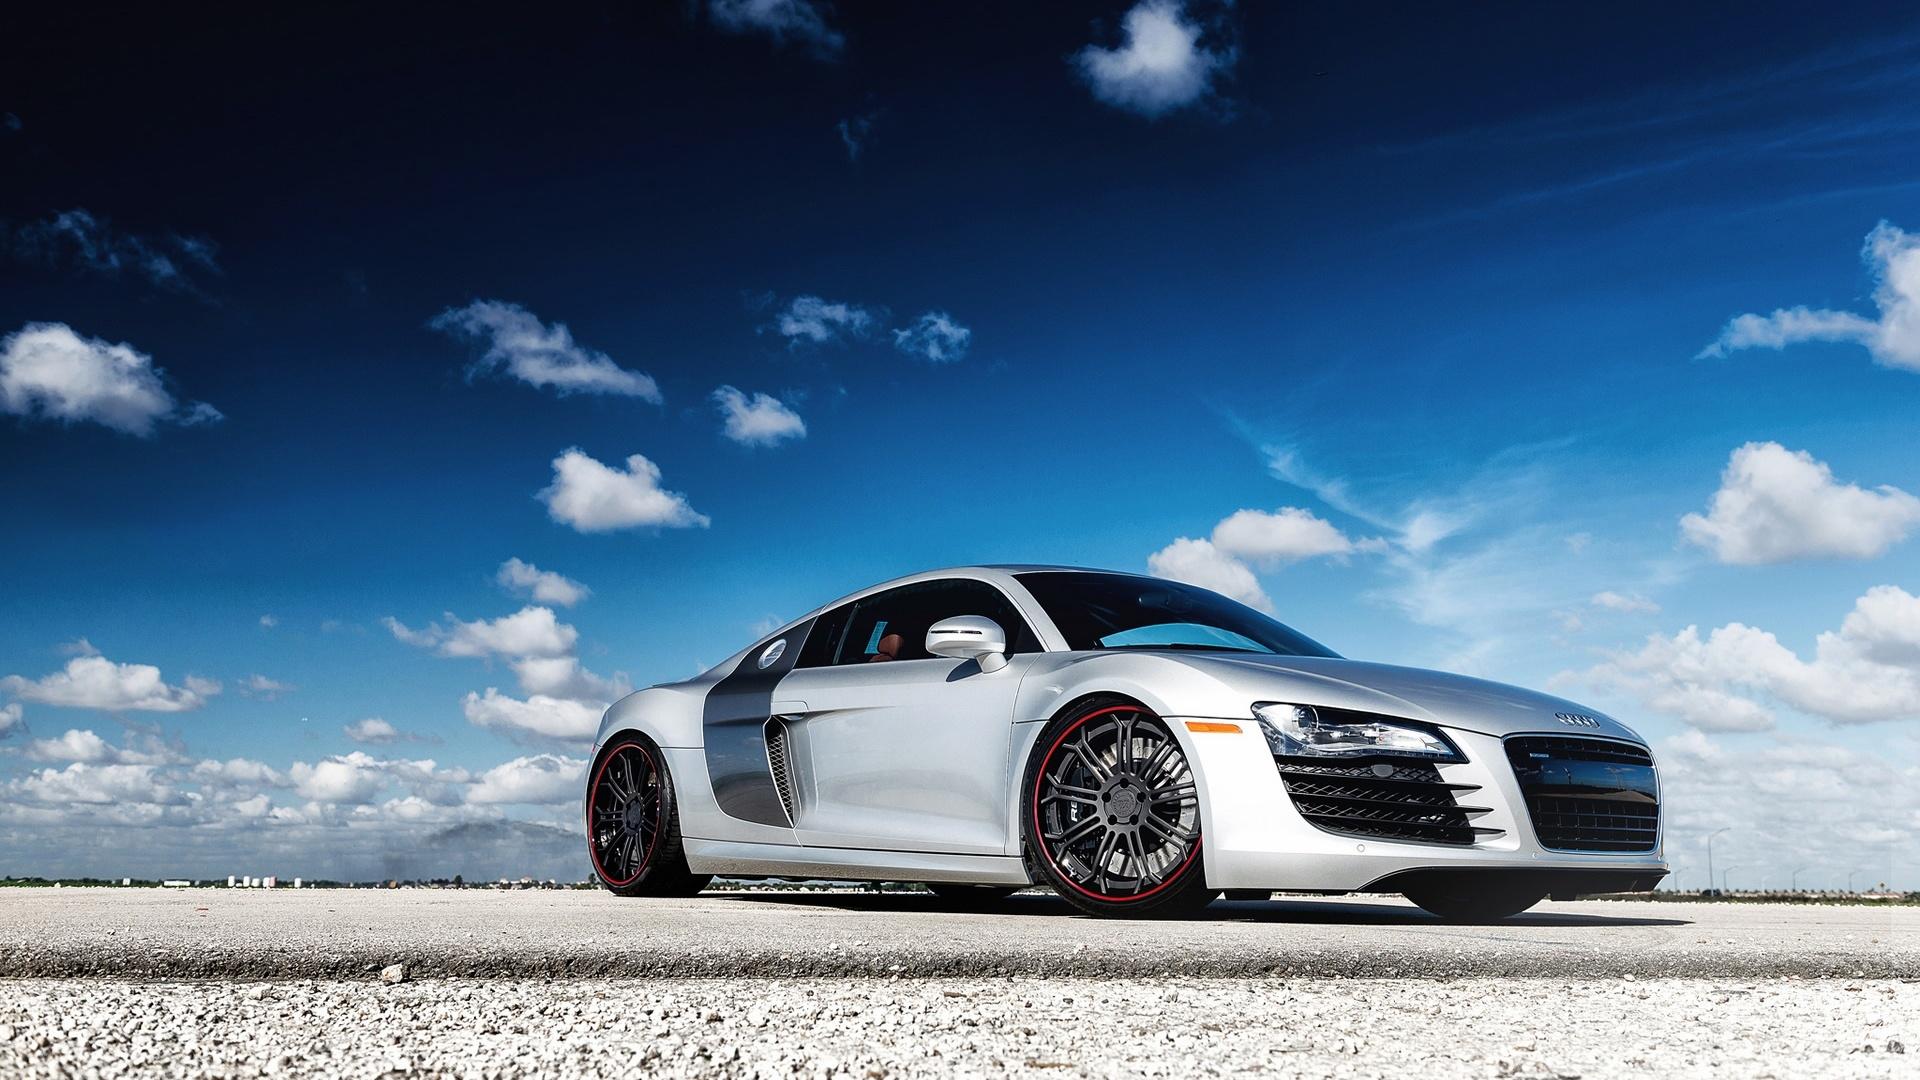 Wallpaper Mobil Sport 3d Sports Cars Backgrounds Hd Pixelstalk Net